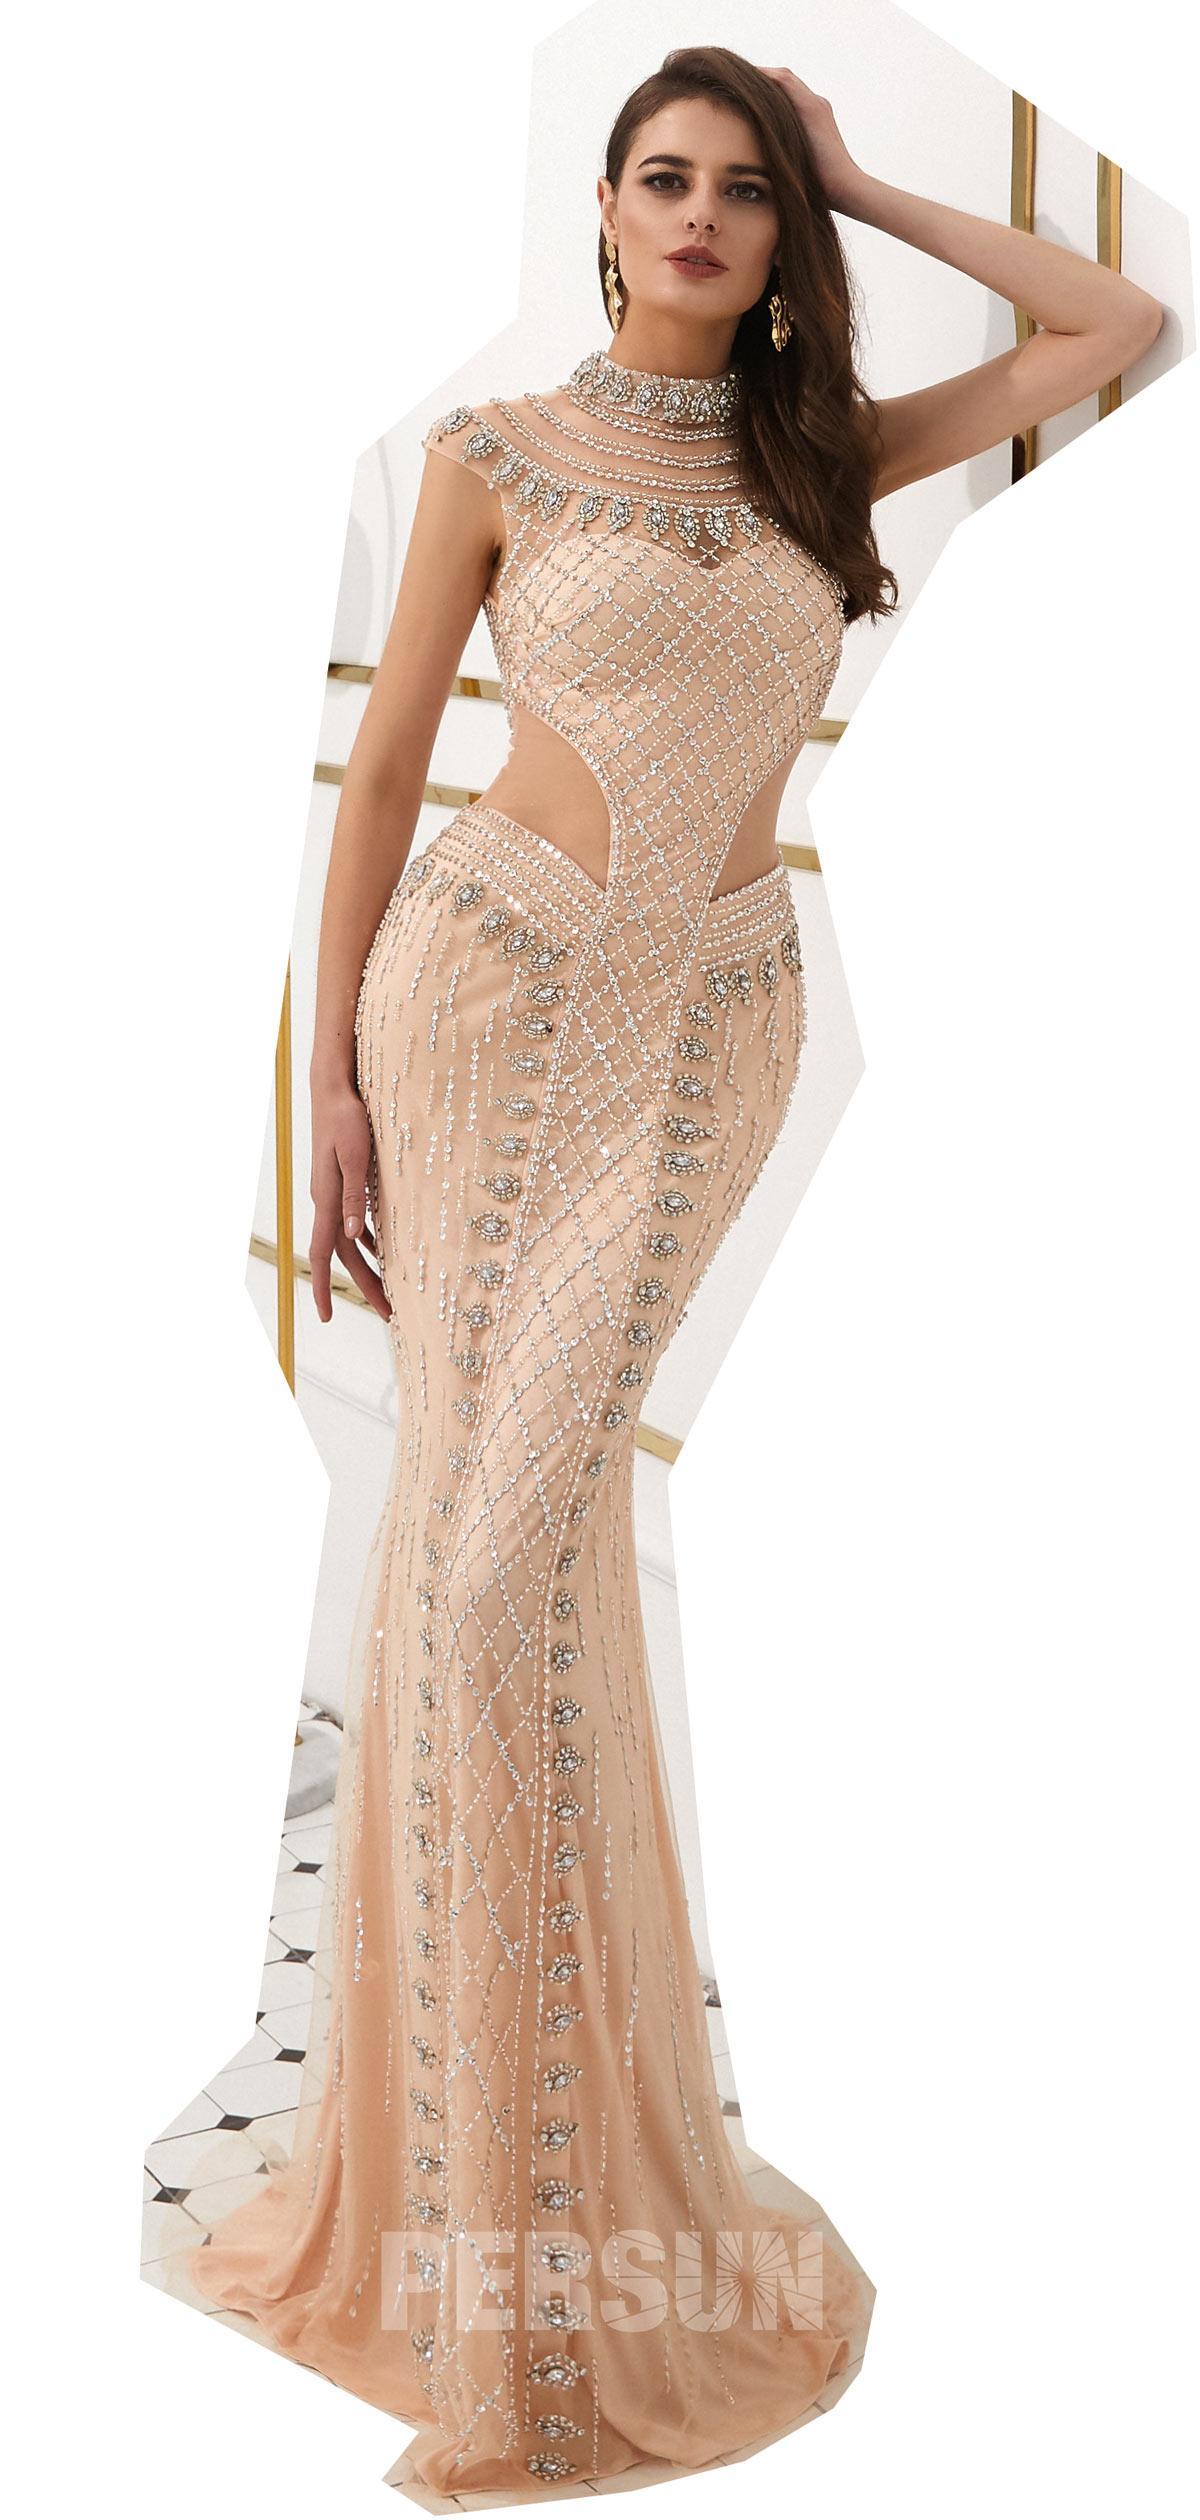 robe de soirée champagne brodée 2020 Persun